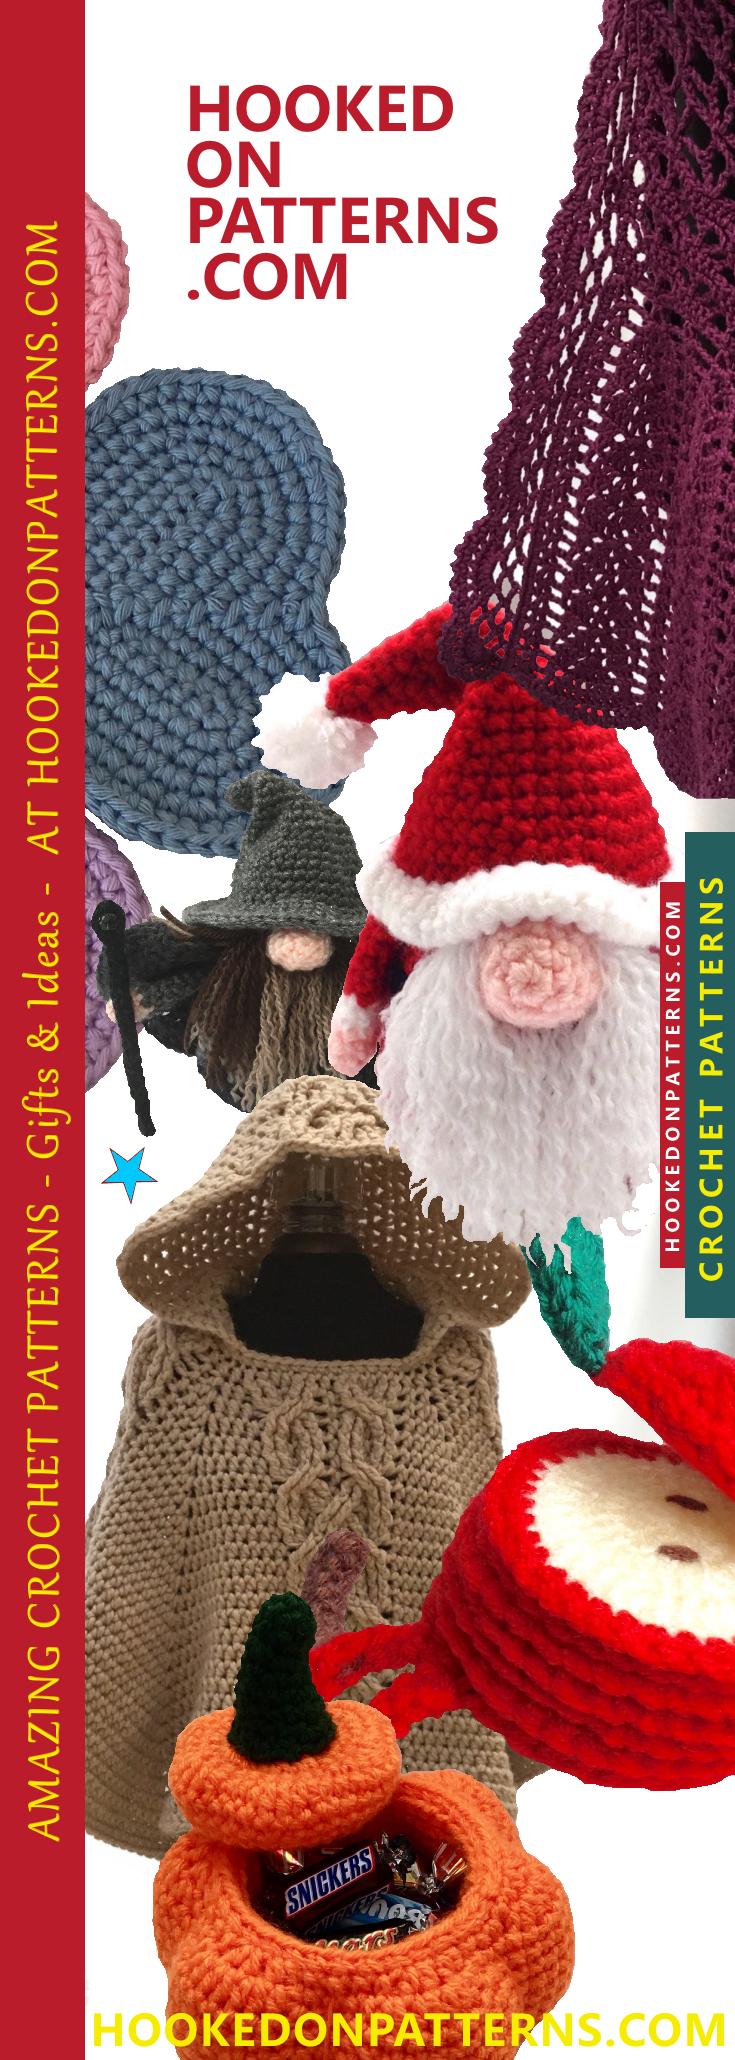 Hooked Patterns - Crochet Patterns, Free Crochet Patterns, Crochet ...